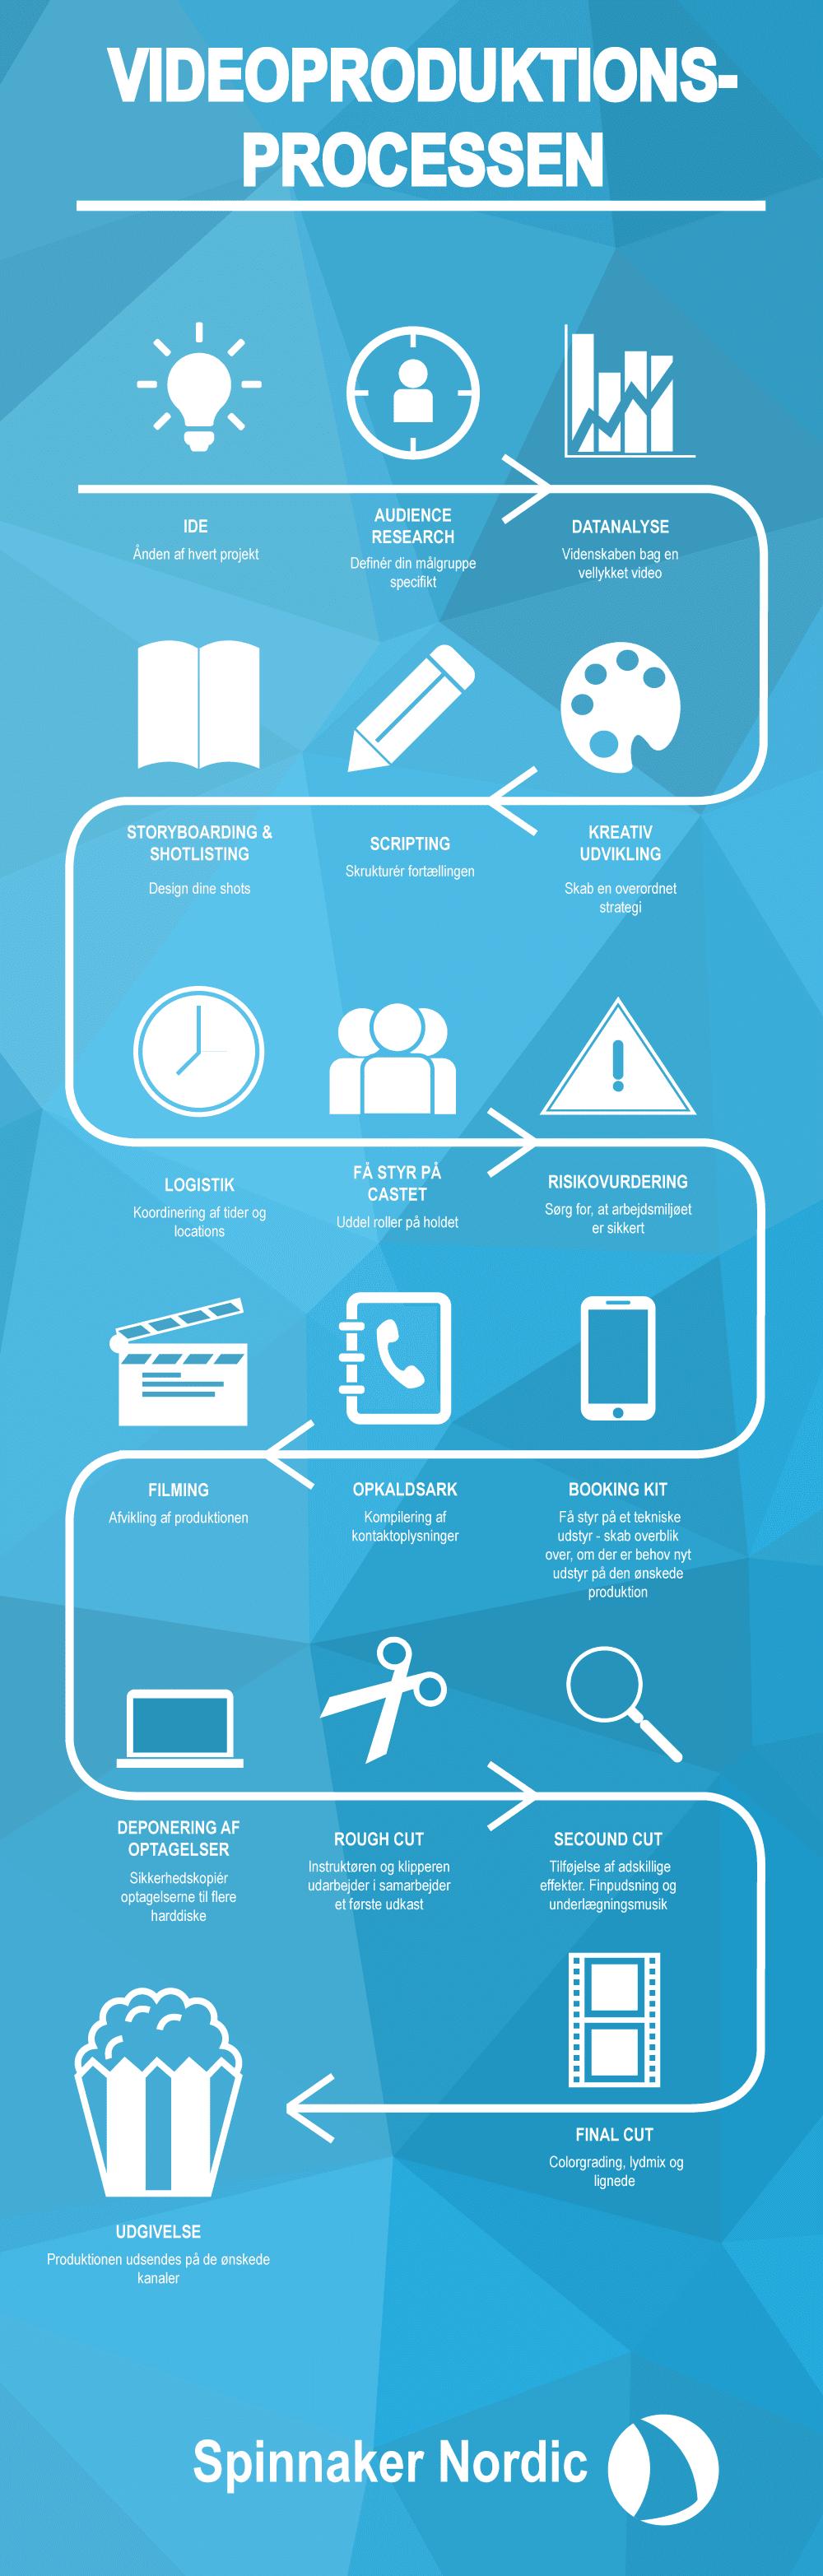 Videoproduktionsprocessen infografik